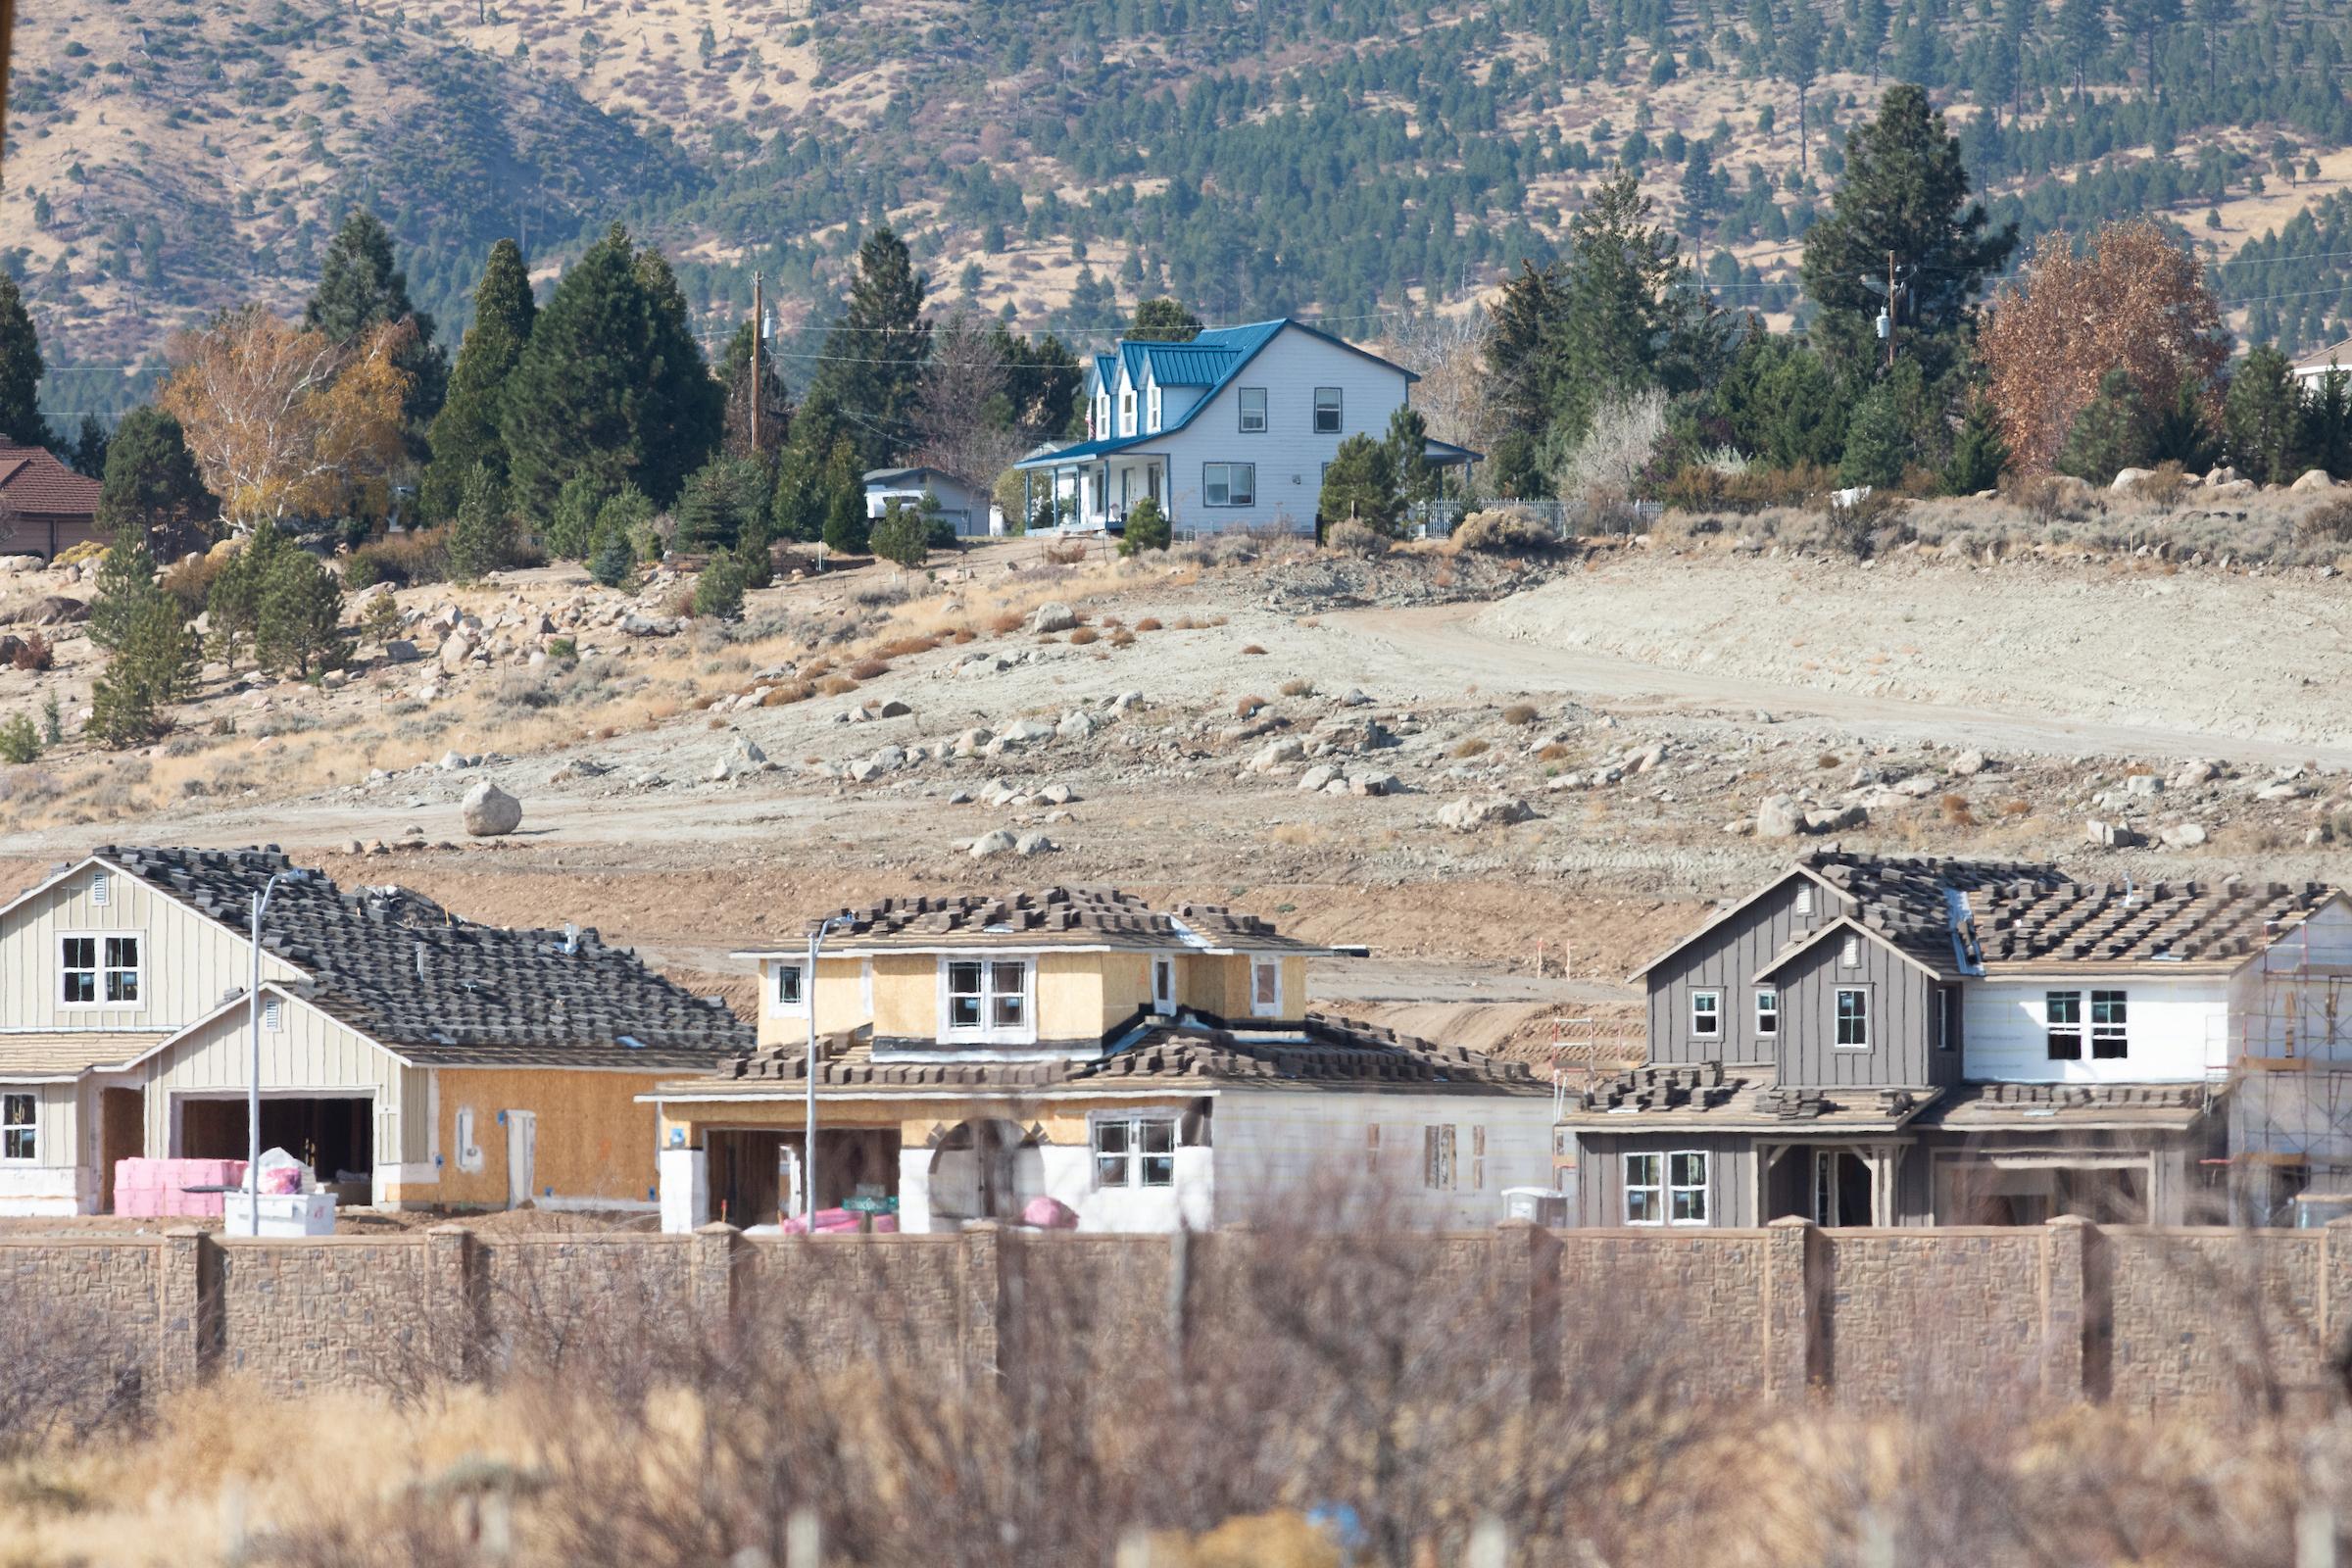 Construction in Verdi, on the western edge of Reno